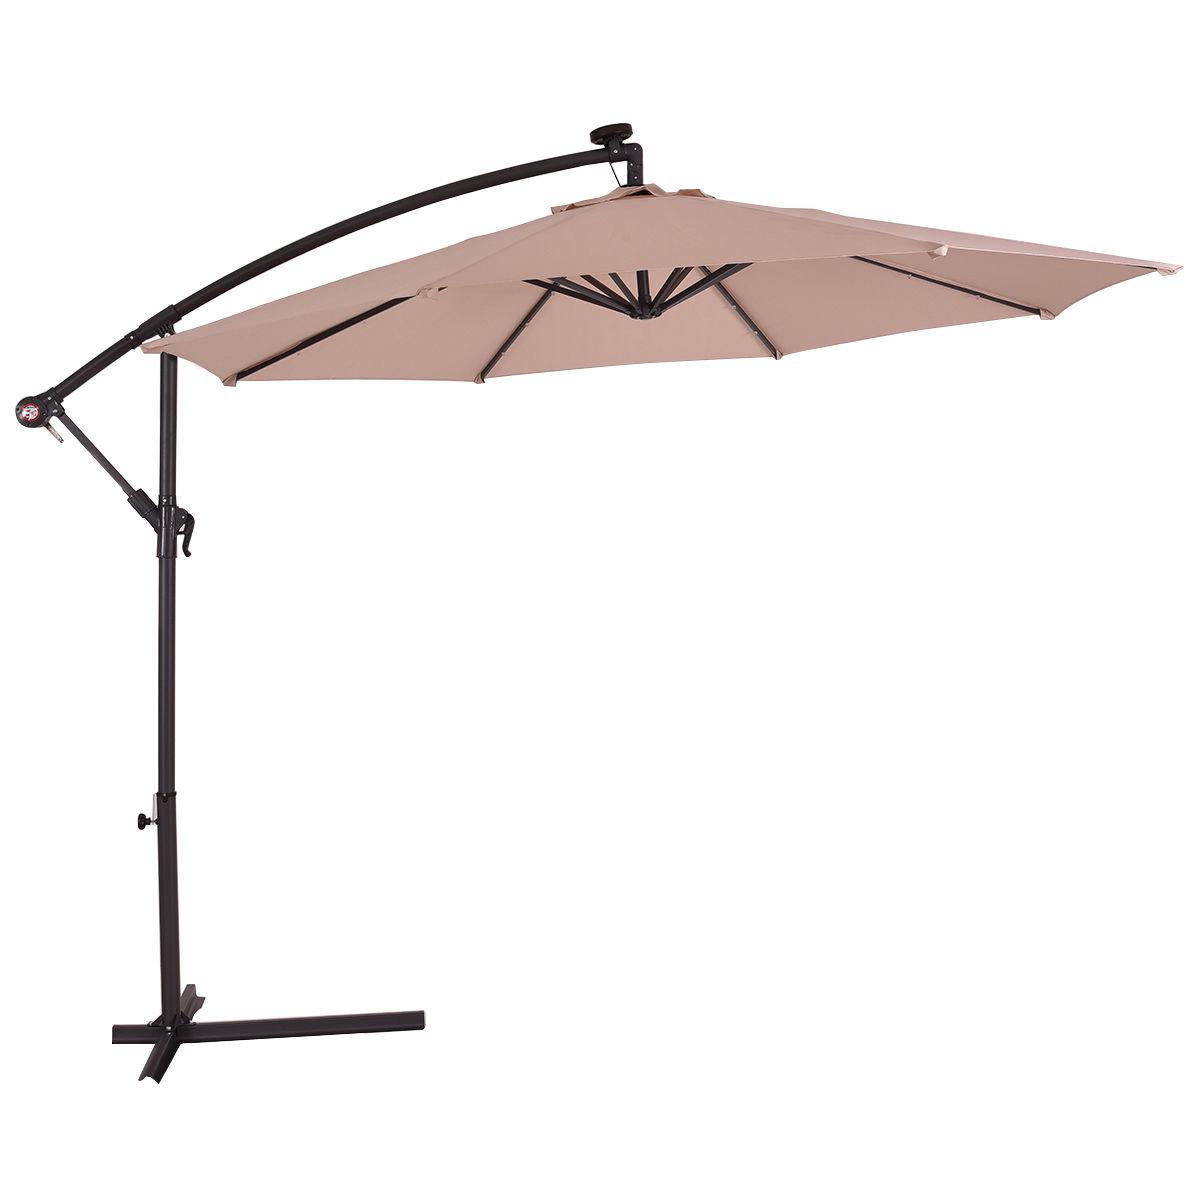 Freeport Park Yajaira 10' Cantilever Umbrella Regarding Popular Judah Cantilever Umbrellas (View 4 of 20)